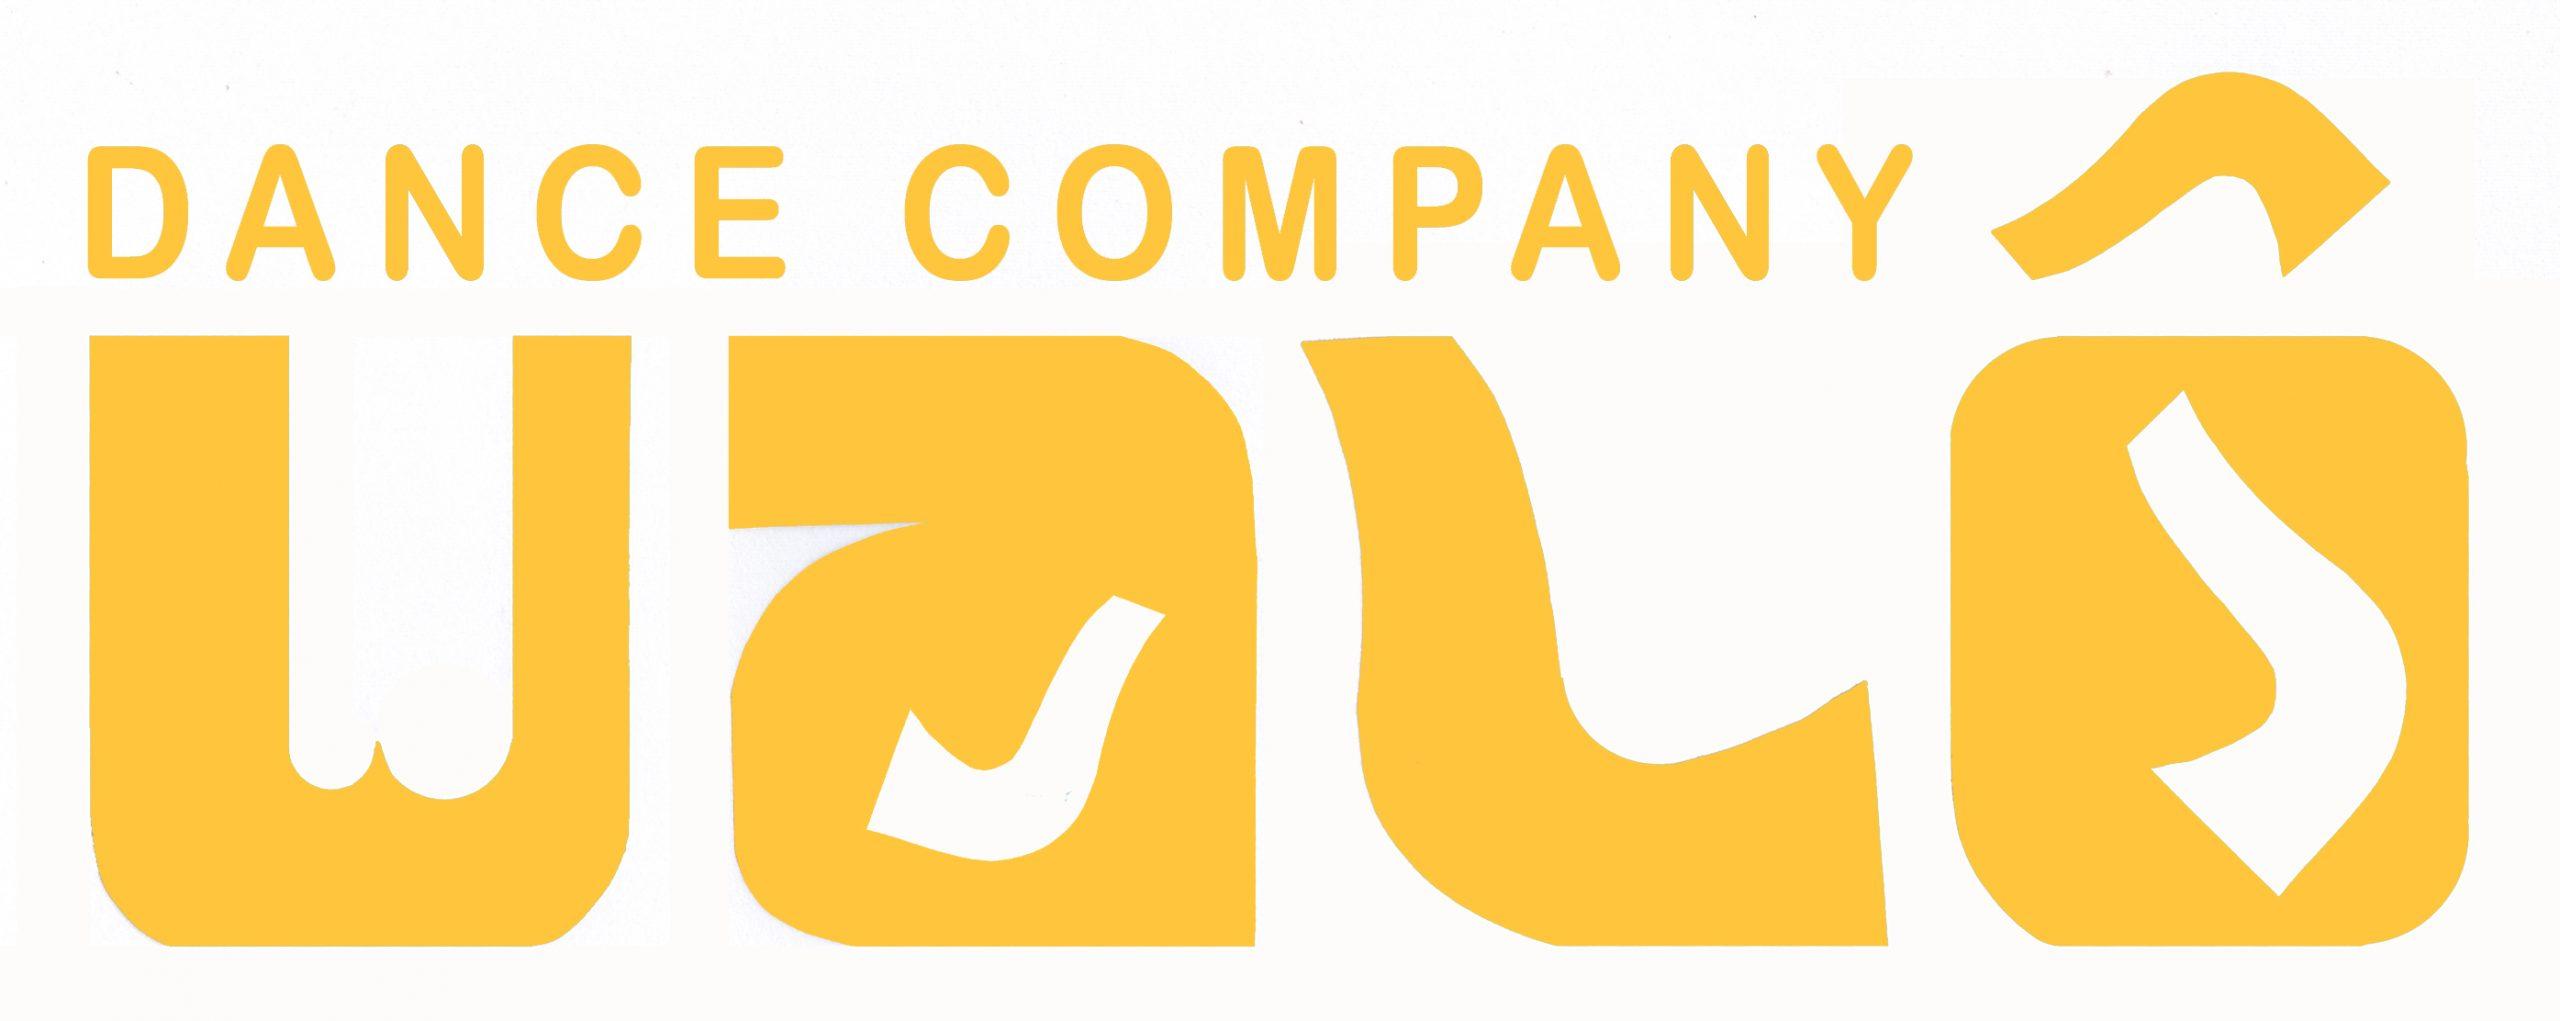 Walo Dance Company-Nous aimons la dance